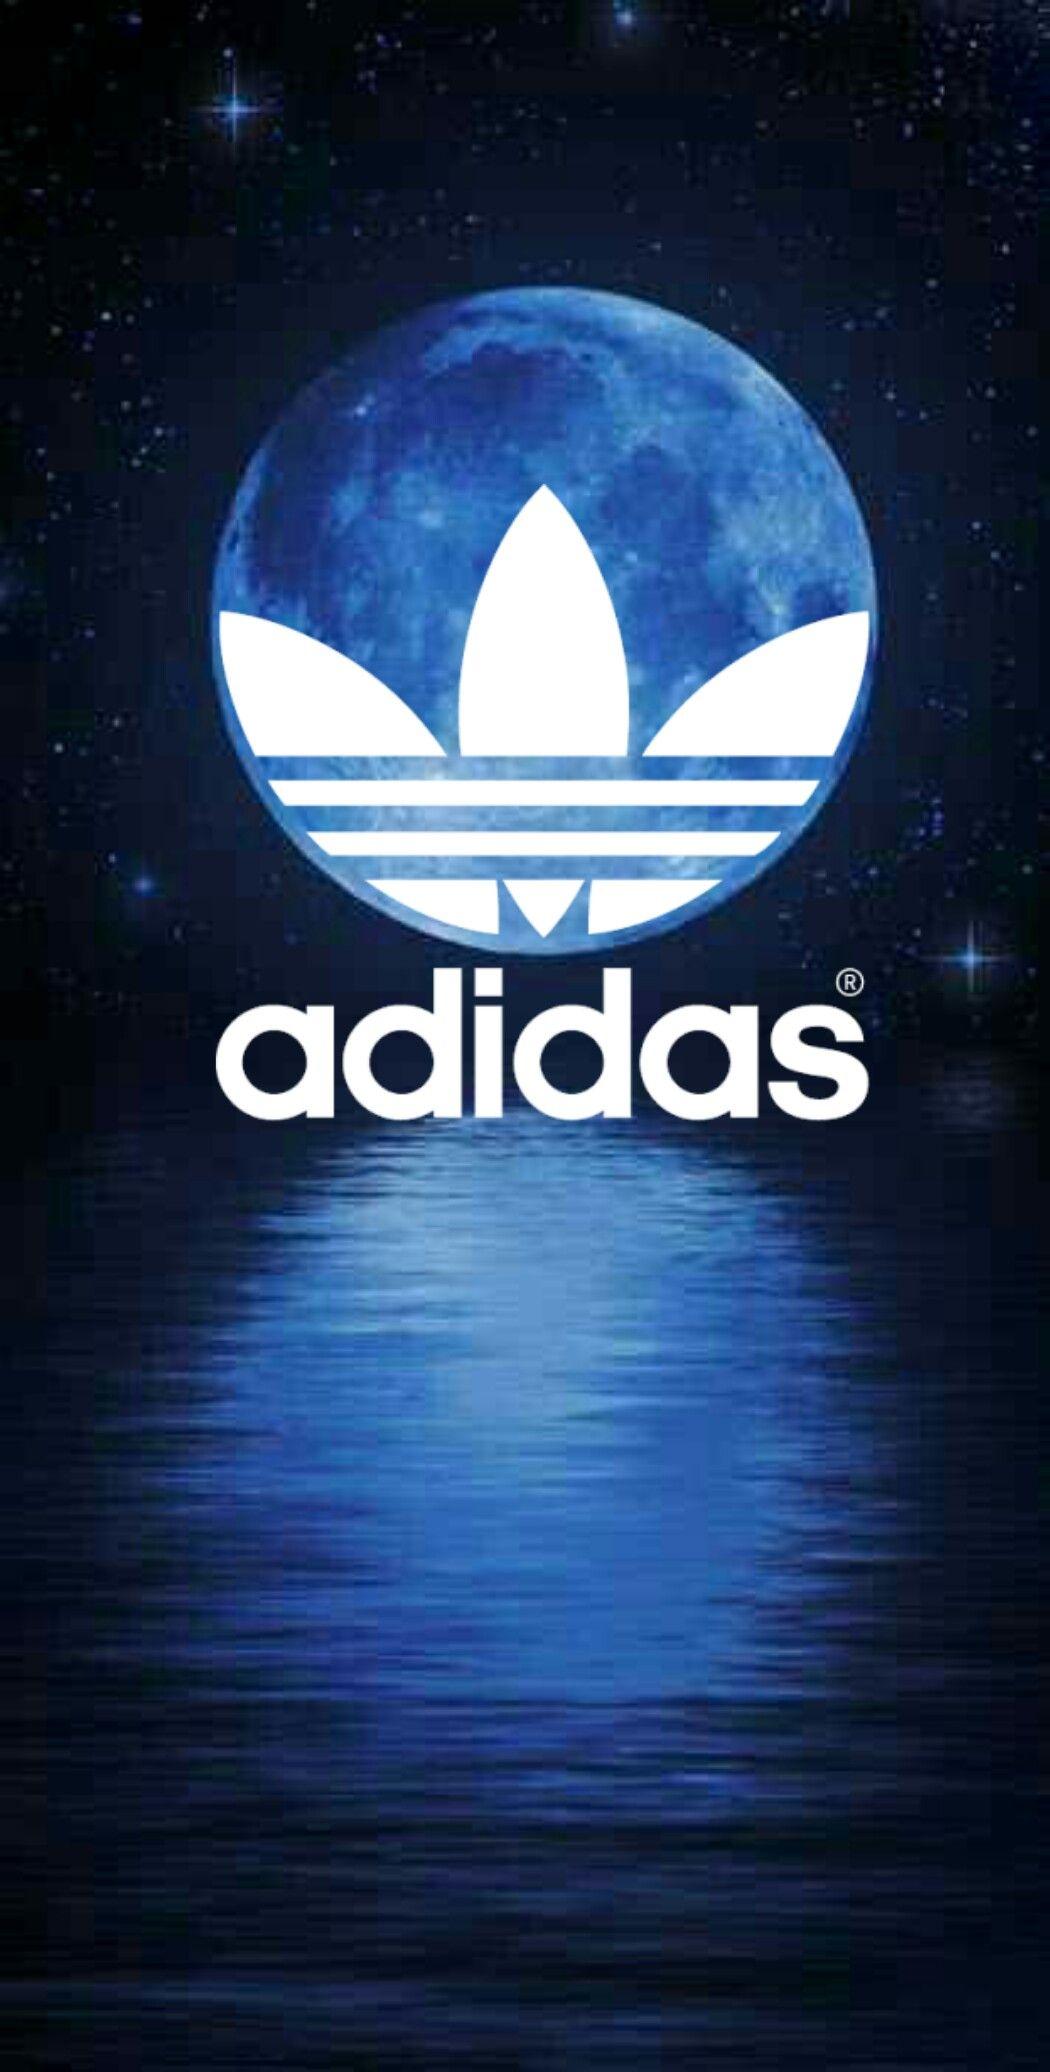 Adidas Black Wallpaper Android Iphone Adidas Pinterest